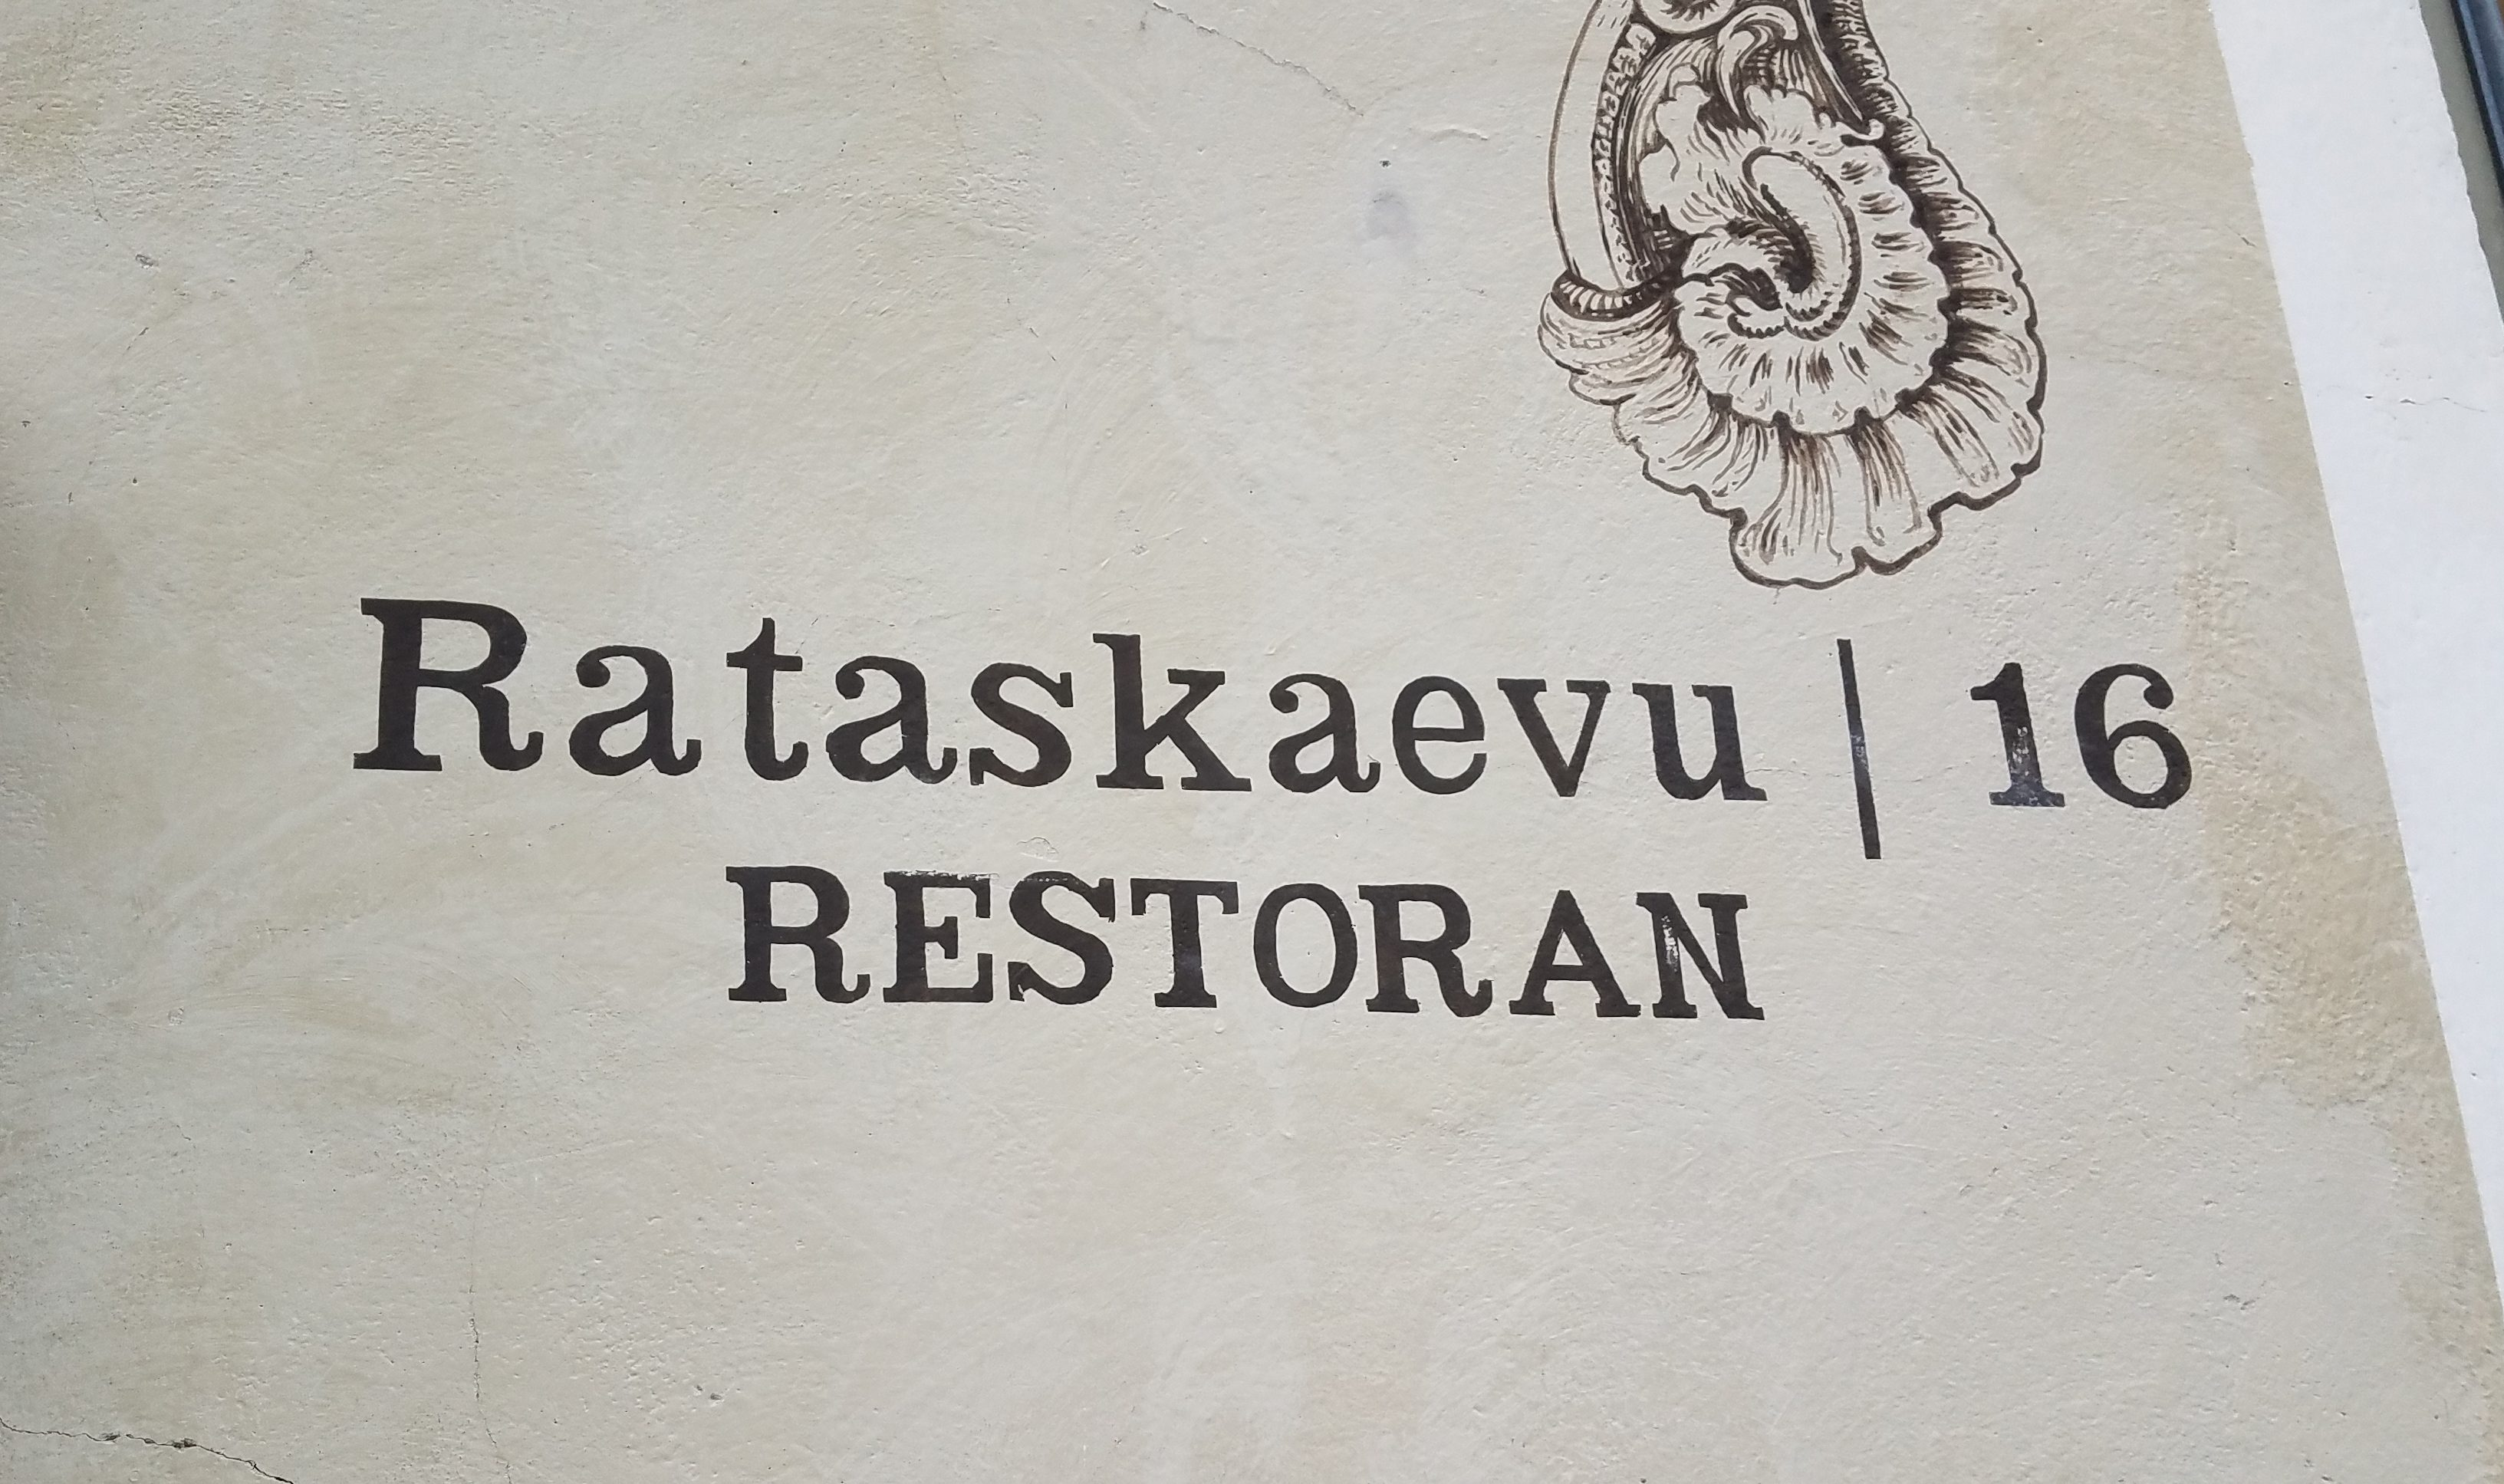 Rataskaevu 16, Tallinn's Most Popular Restaurant